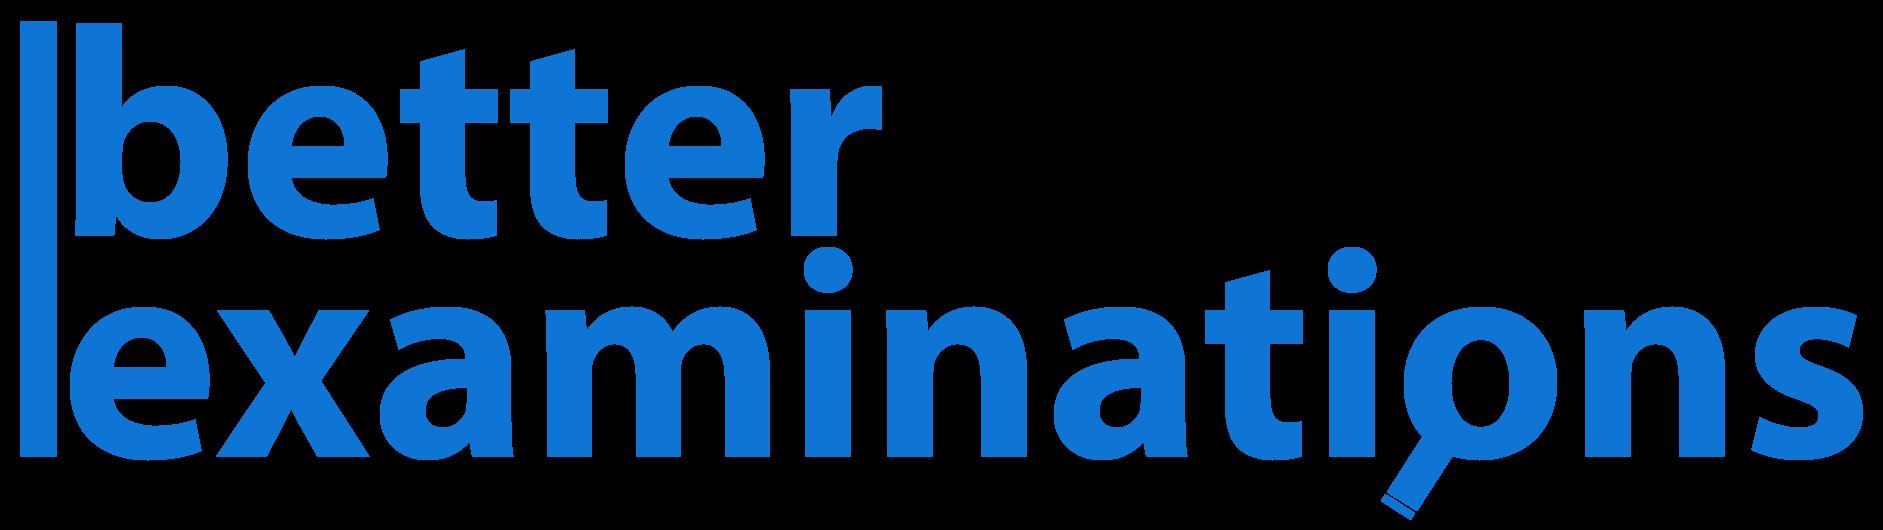 Better examinations logo